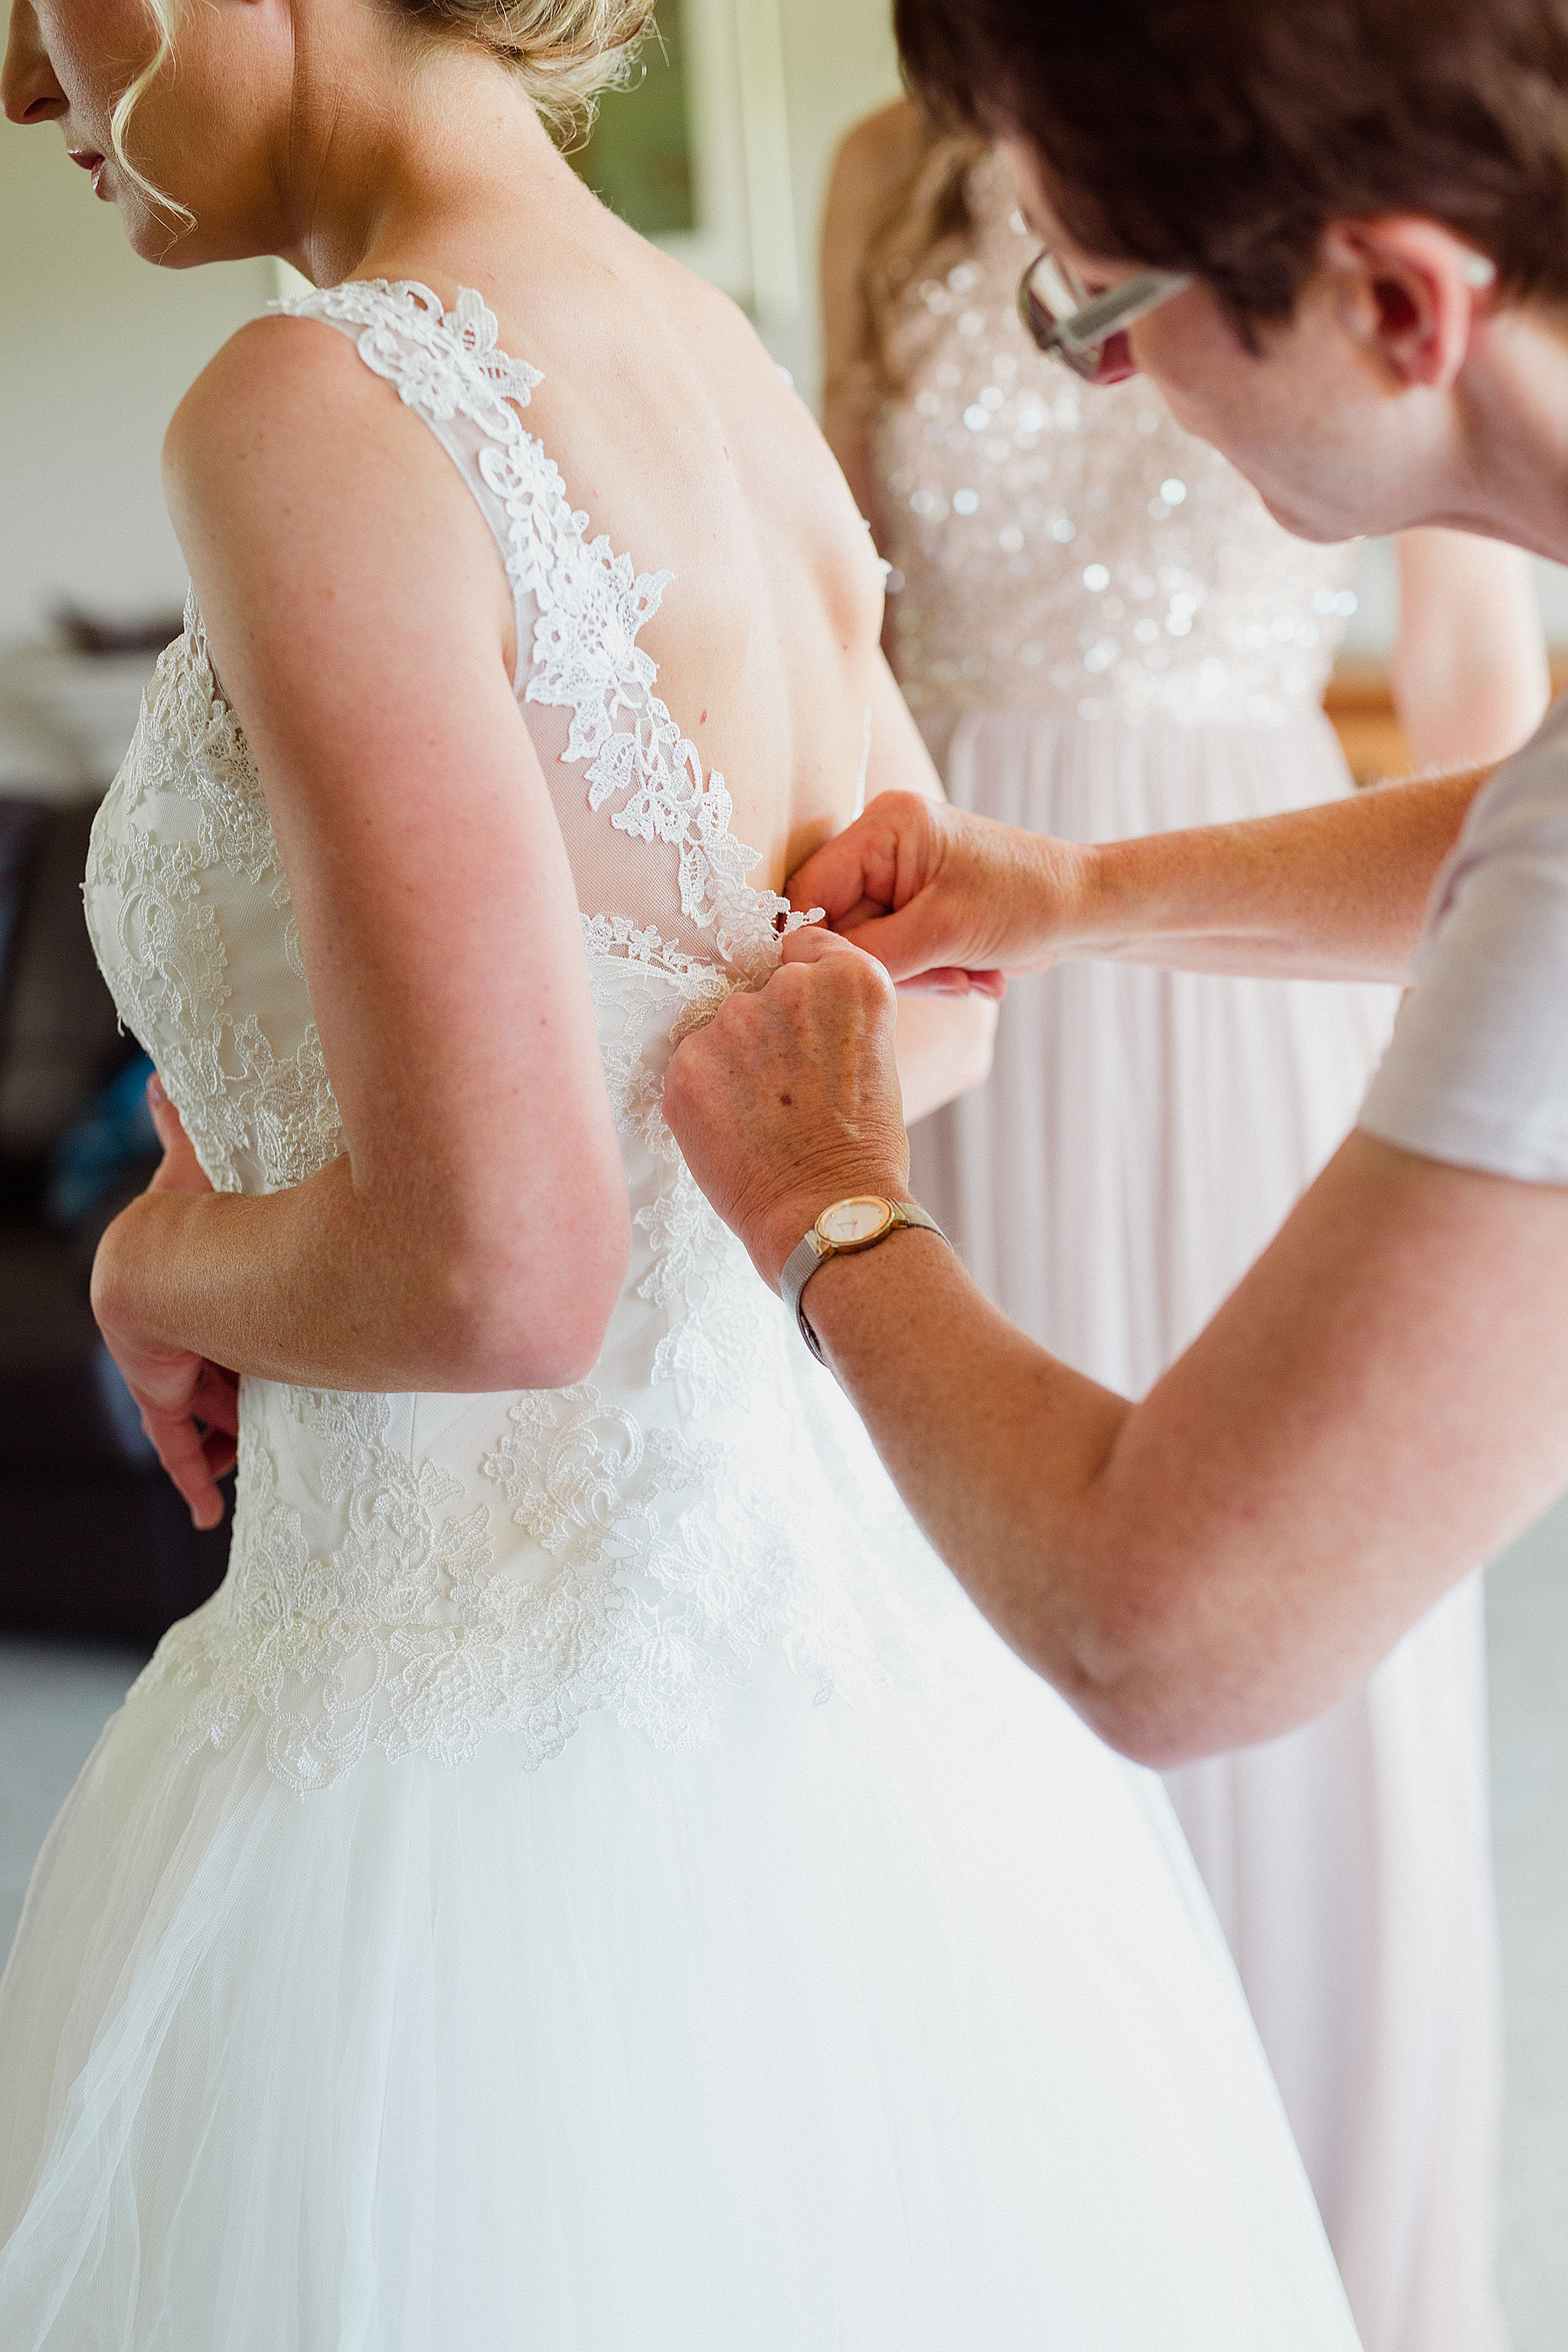 Bridal-Preparation-(43-of-43).jpg